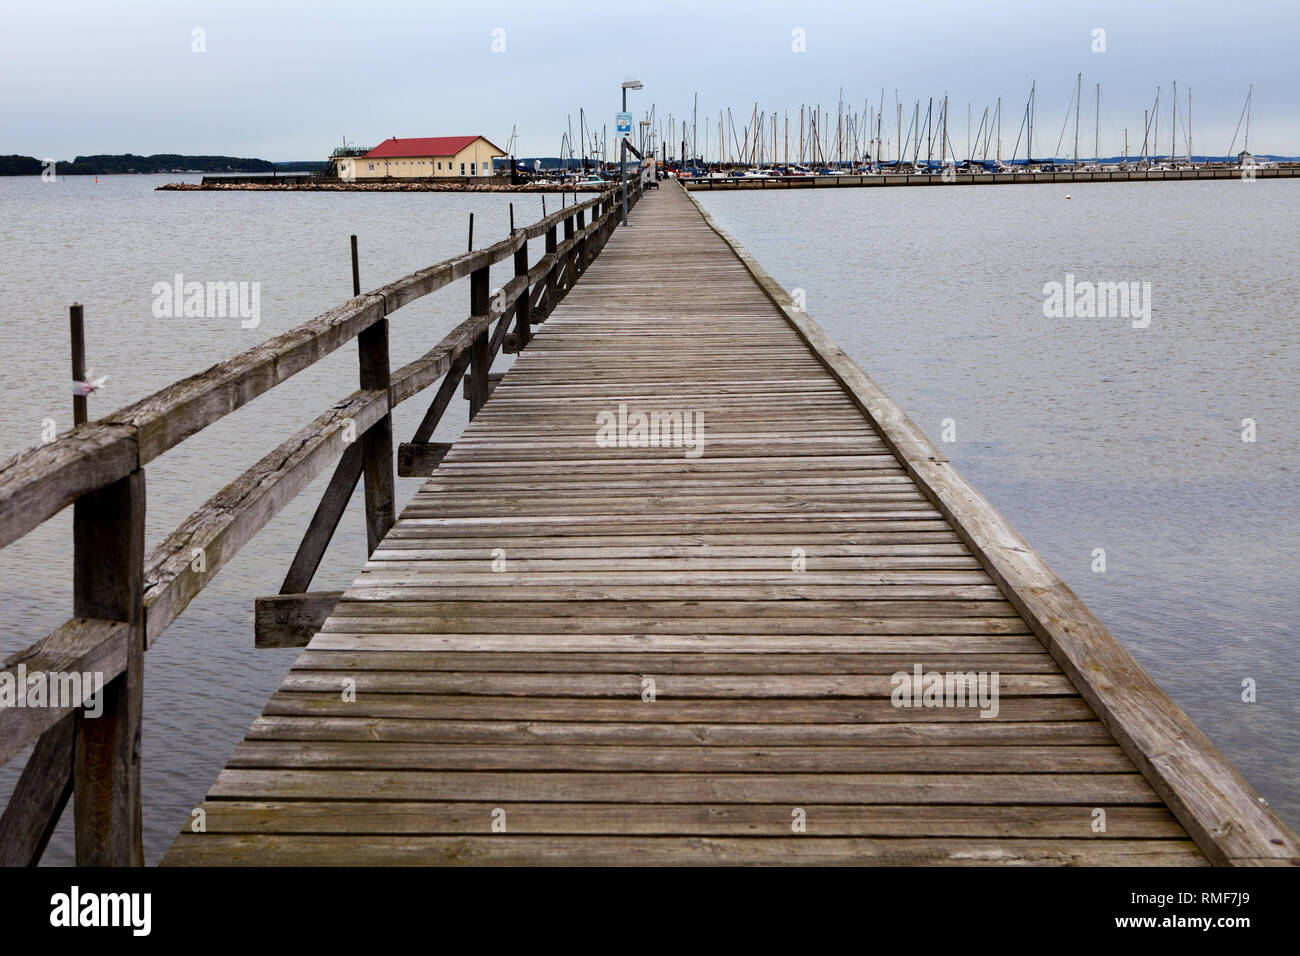 Wackerballig Port, Baltic Sea, Anglia, Schleswig-Holstein, Germany, Europe - Stock Image